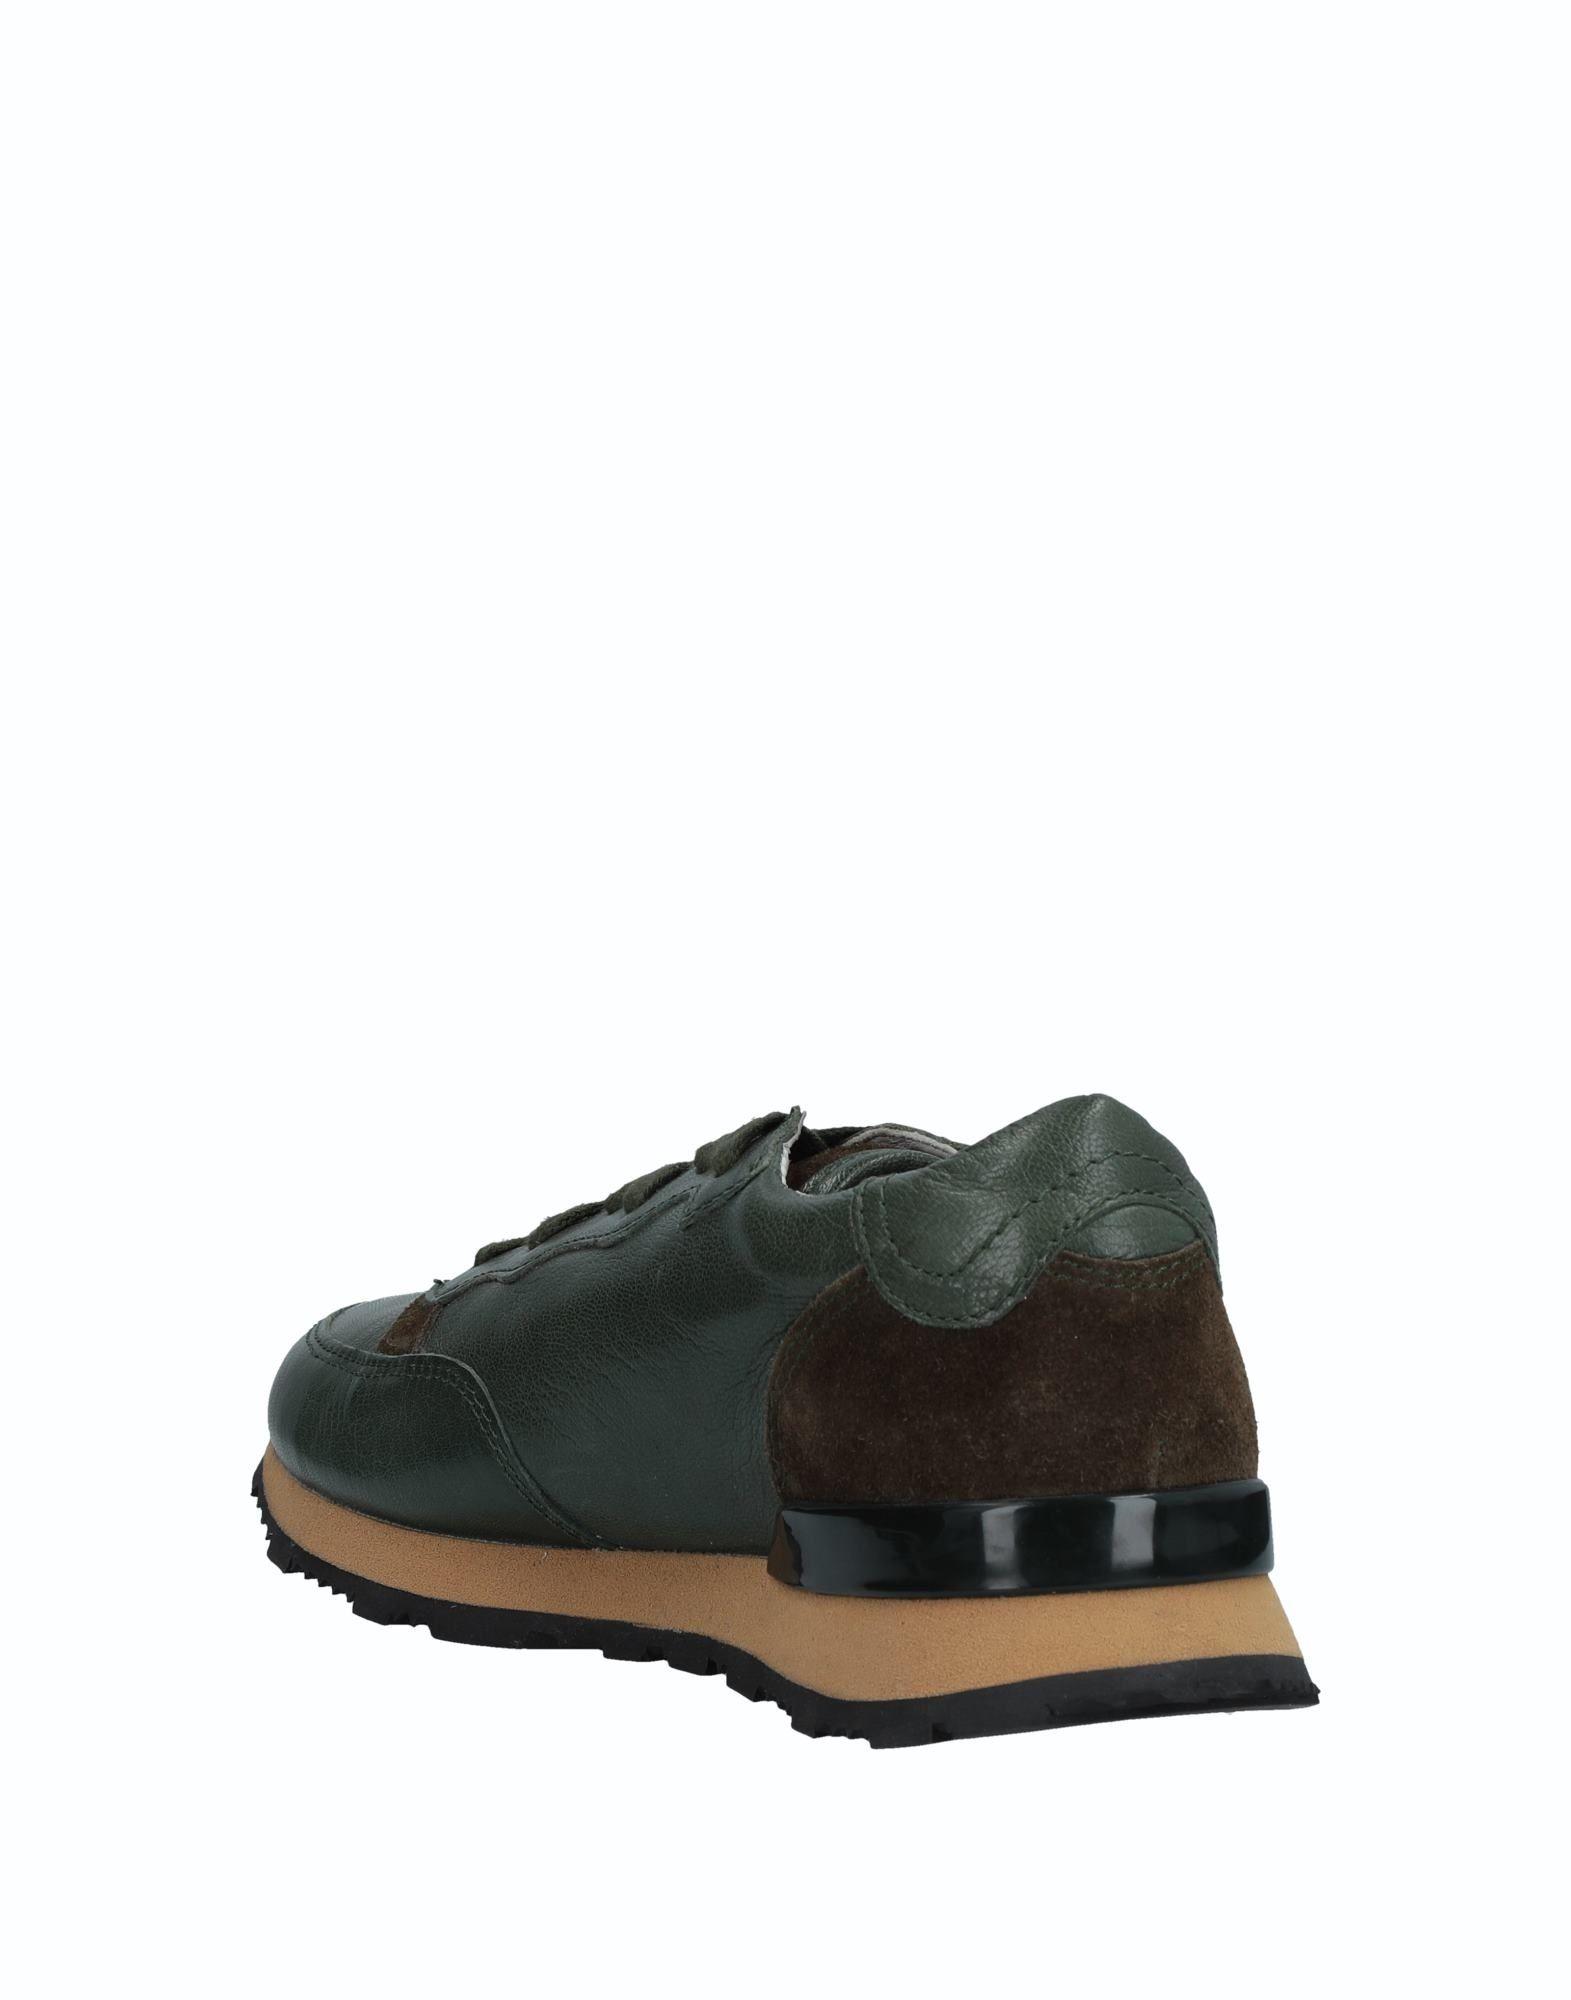 Ishikawa Sneakers - Women Ishikawa Sneakers online on  Canada Canada Canada - 11523616PN 52345c